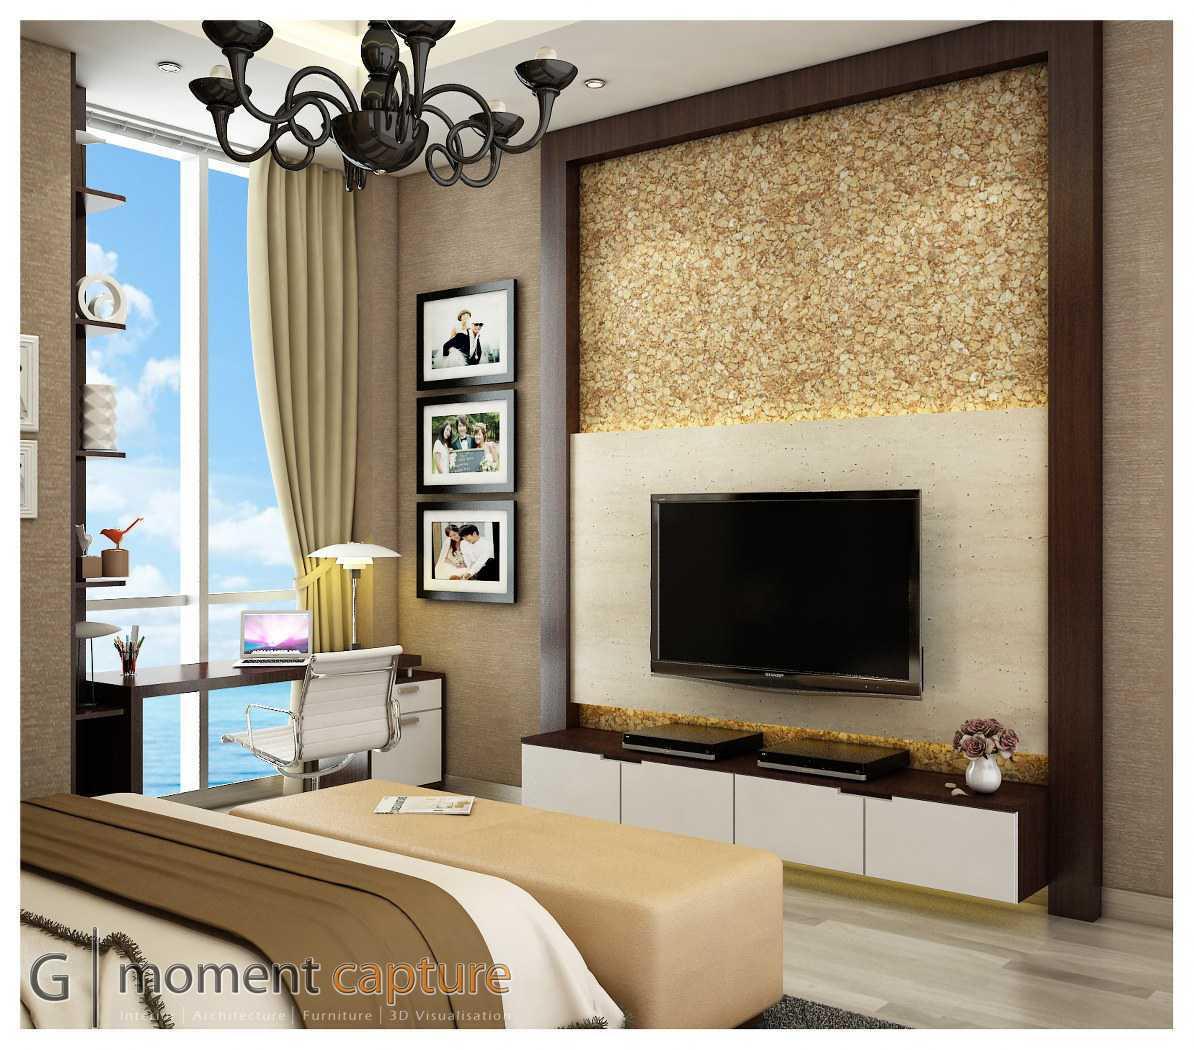 G | Momentcapture Private Apartment Jakarta, Daerah Khusus Ibukota Jakarta, Indonesia Jakarta, Daerah Khusus Ibukota Jakarta, Indonesia Master Bedroom Modern 40772